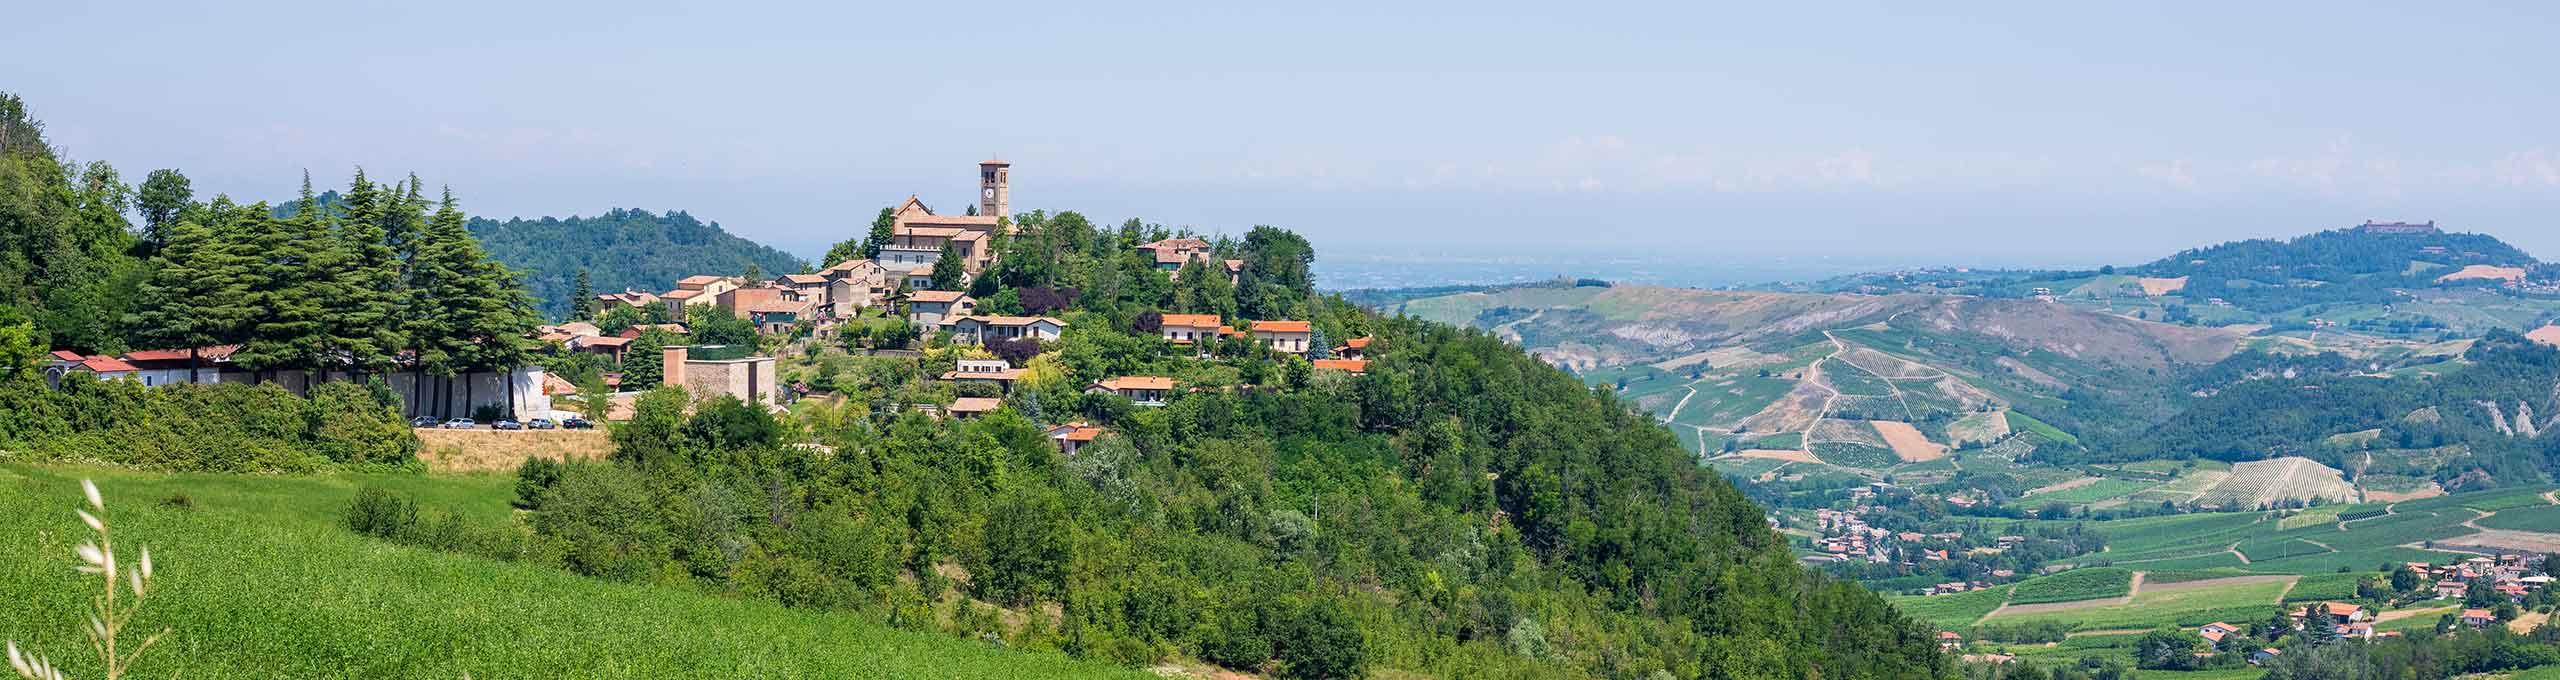 Fortunago, Oltrepò Pavese